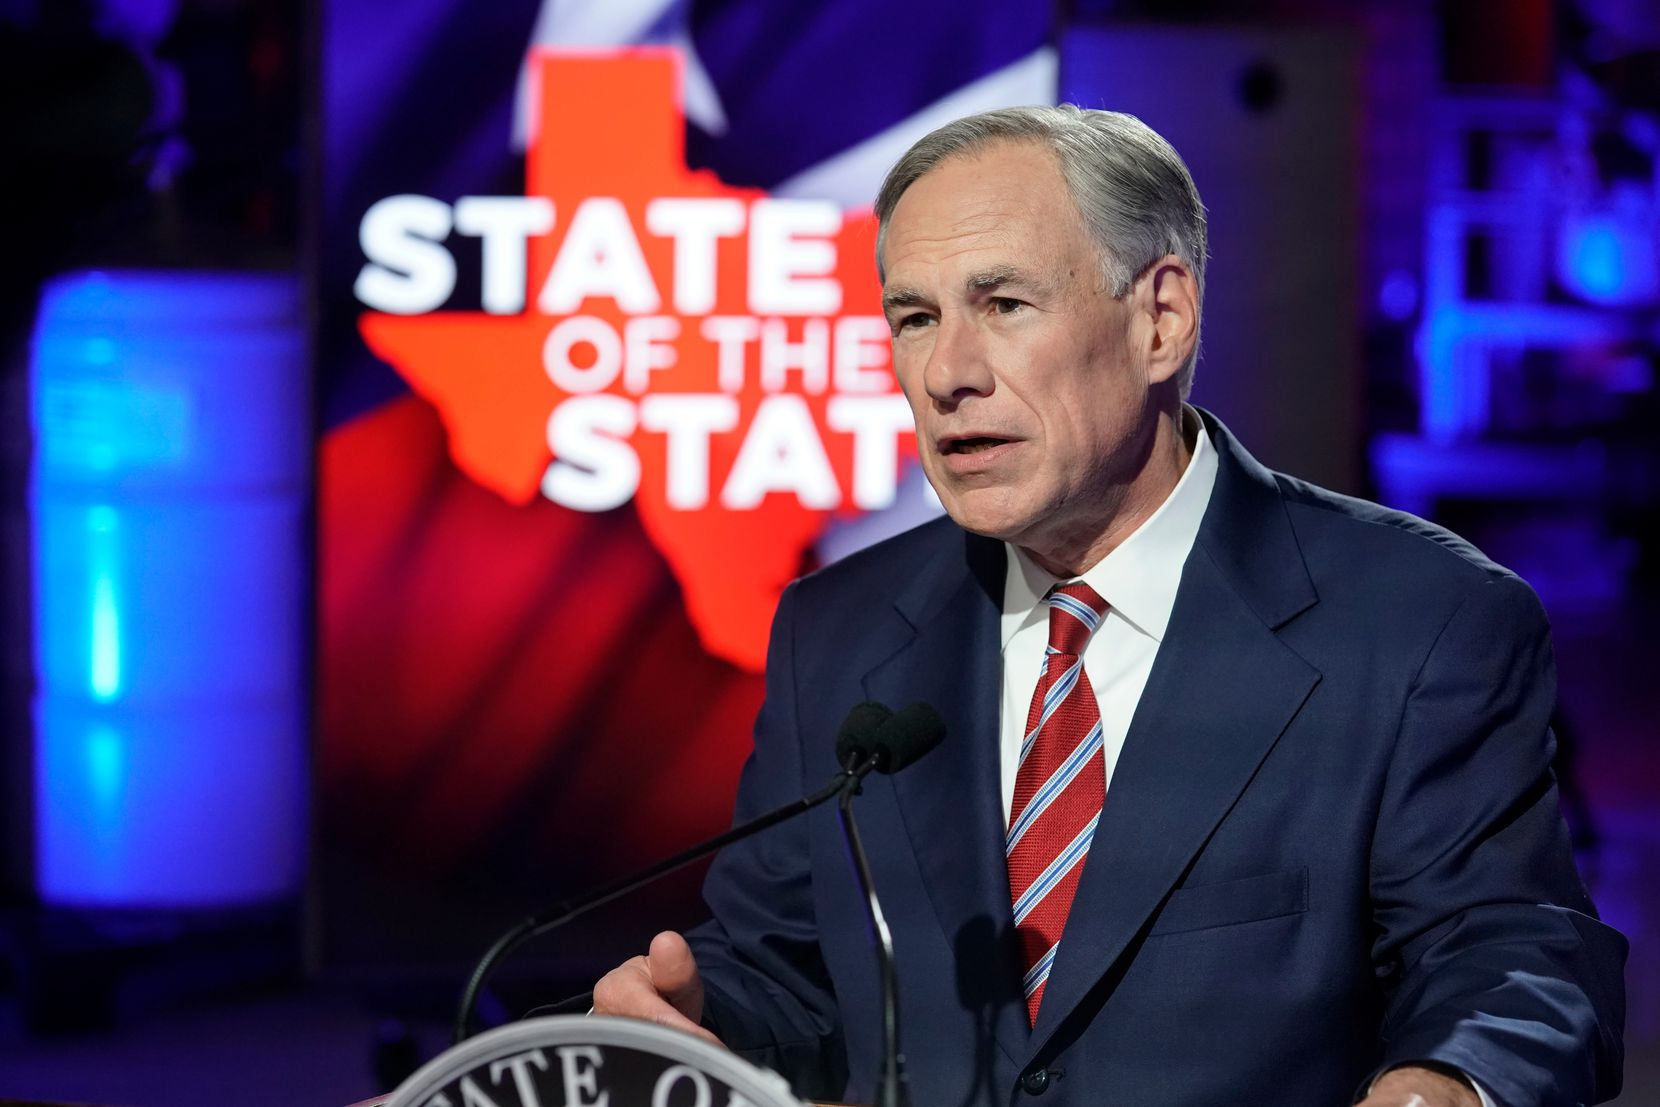 Gov. Greg Abbott prepared to deliver his State of the State speech at Visionary Fiber Technologies outside Lockhart on Feb. 1.